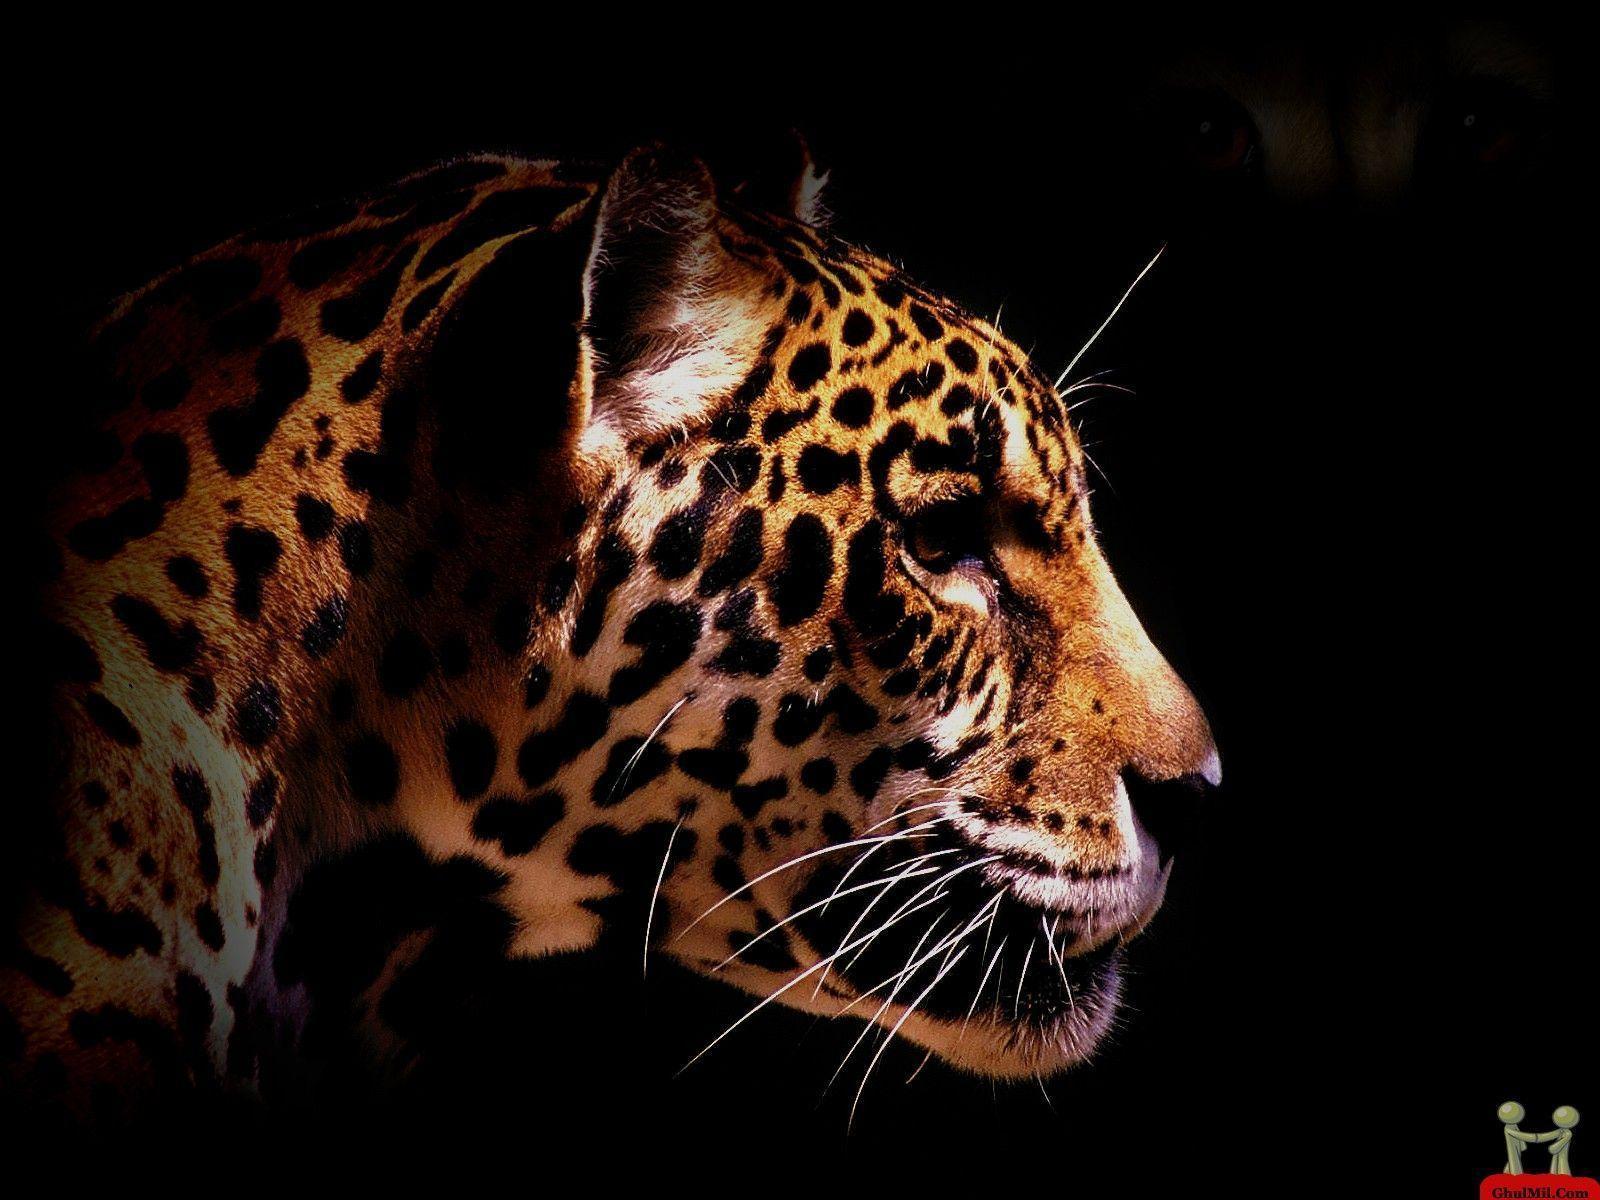 Wallpaper Cheetah Pair Hd Animals 6057: Cheetah Wallpapers HD